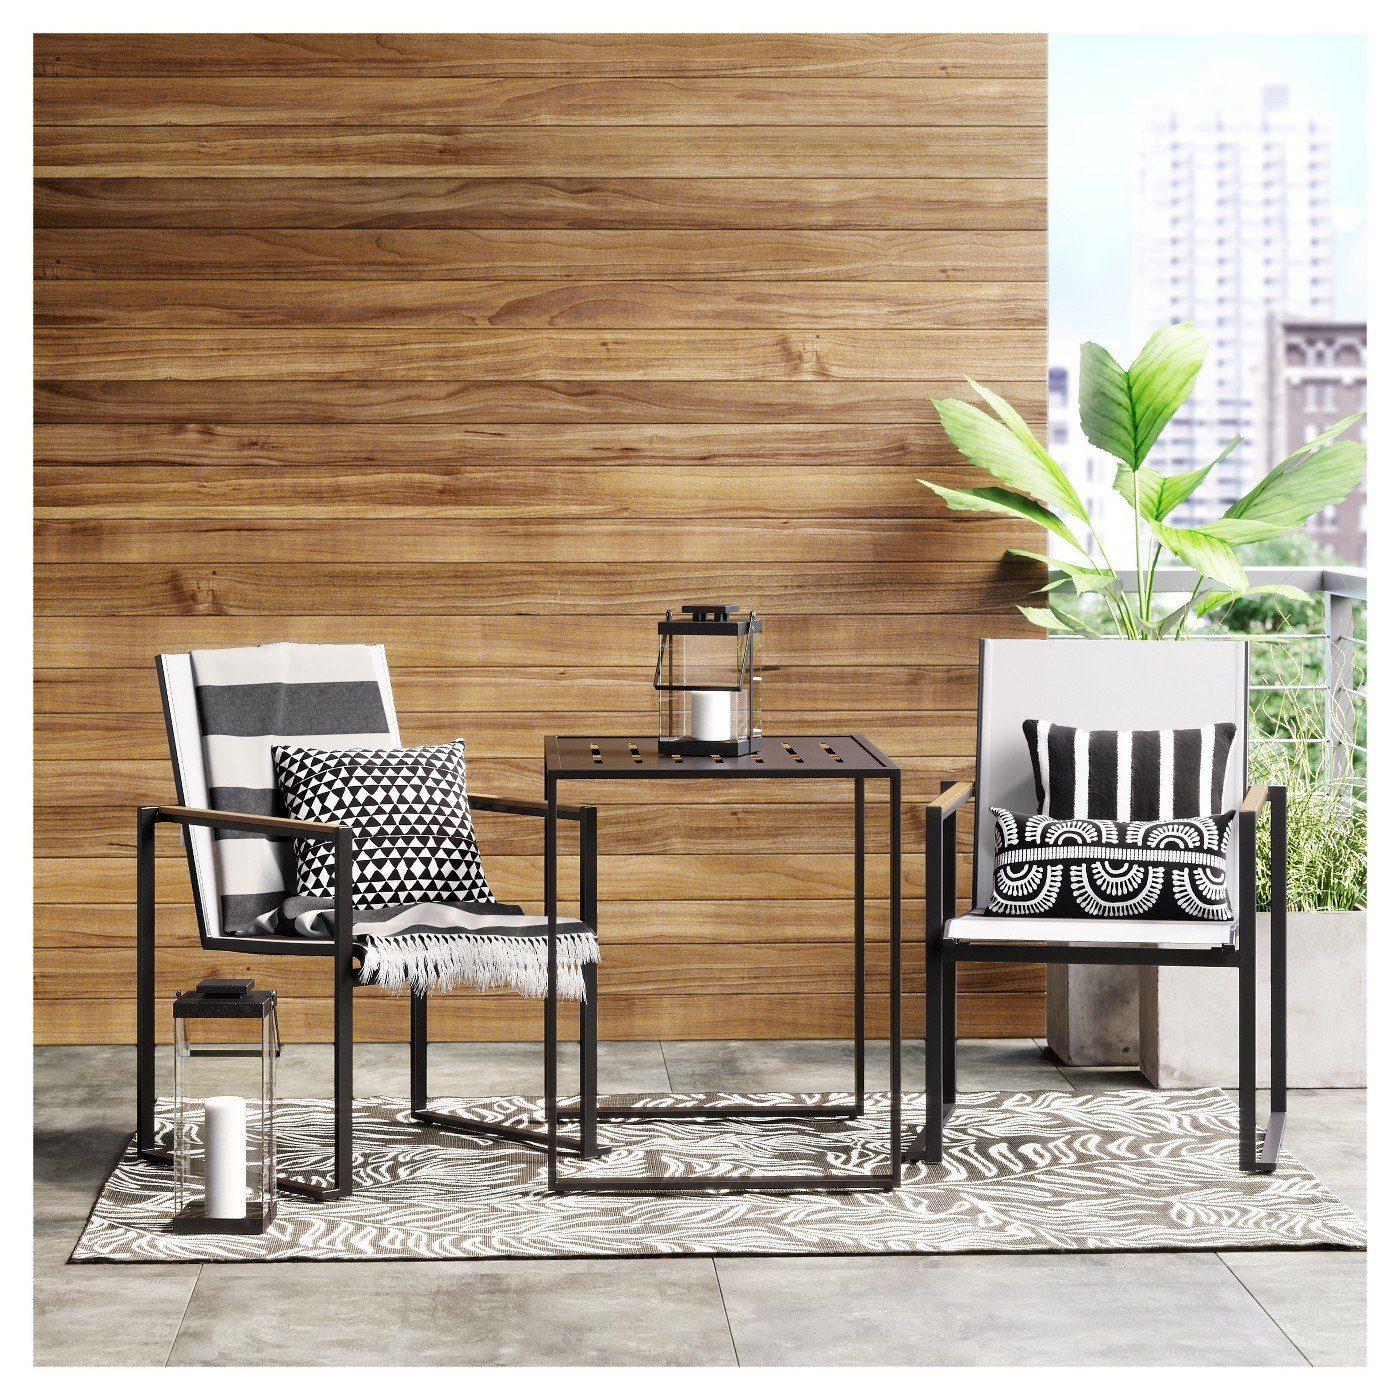 patio season furniture round-up